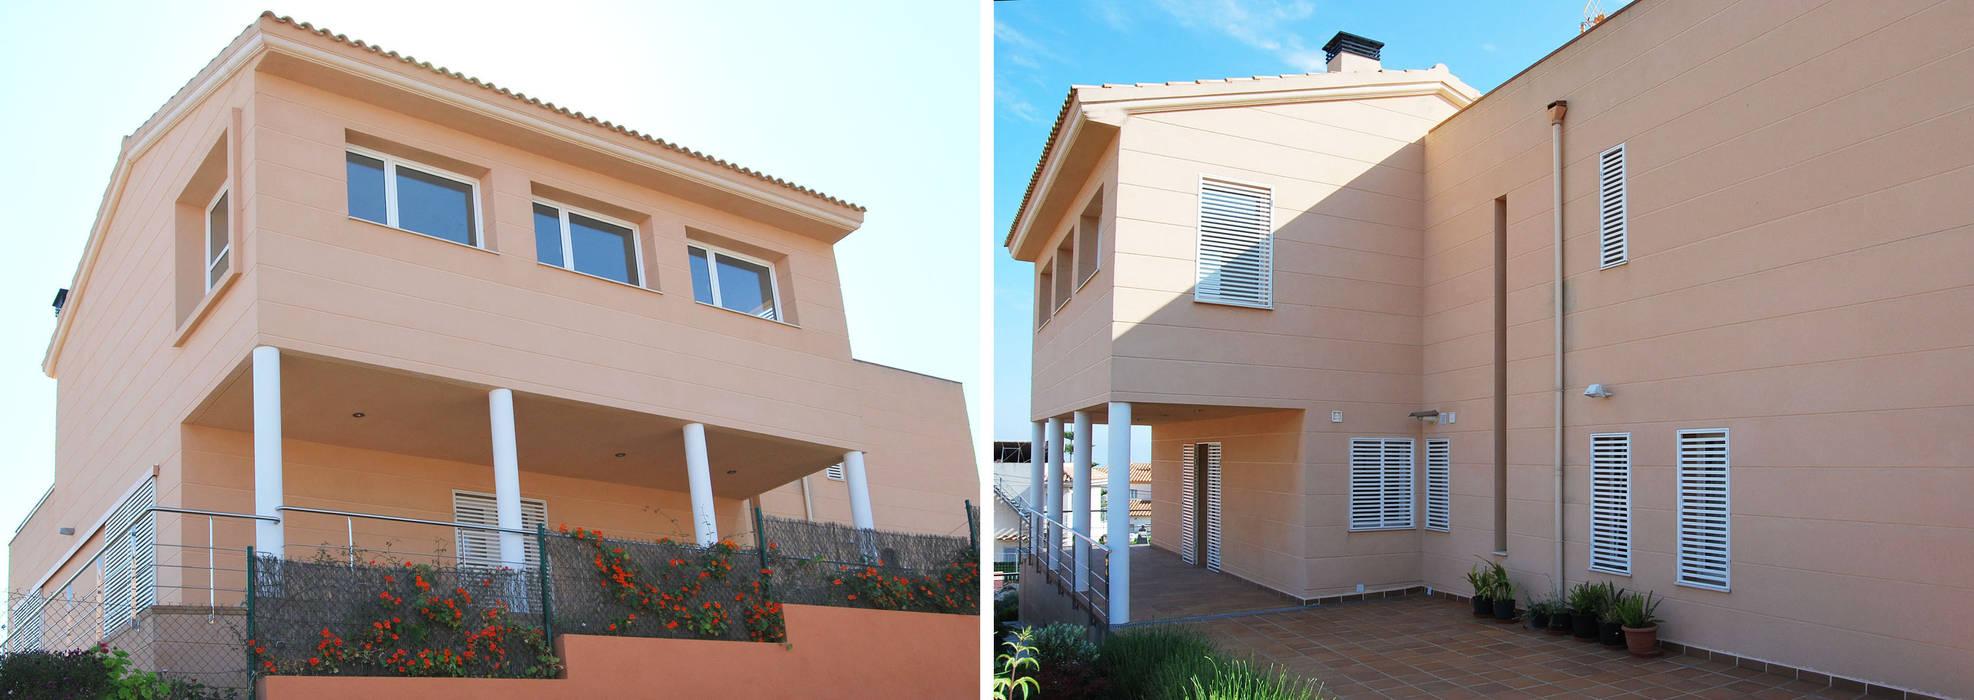 jjdelgado arquitectura Case in stile mediterraneo